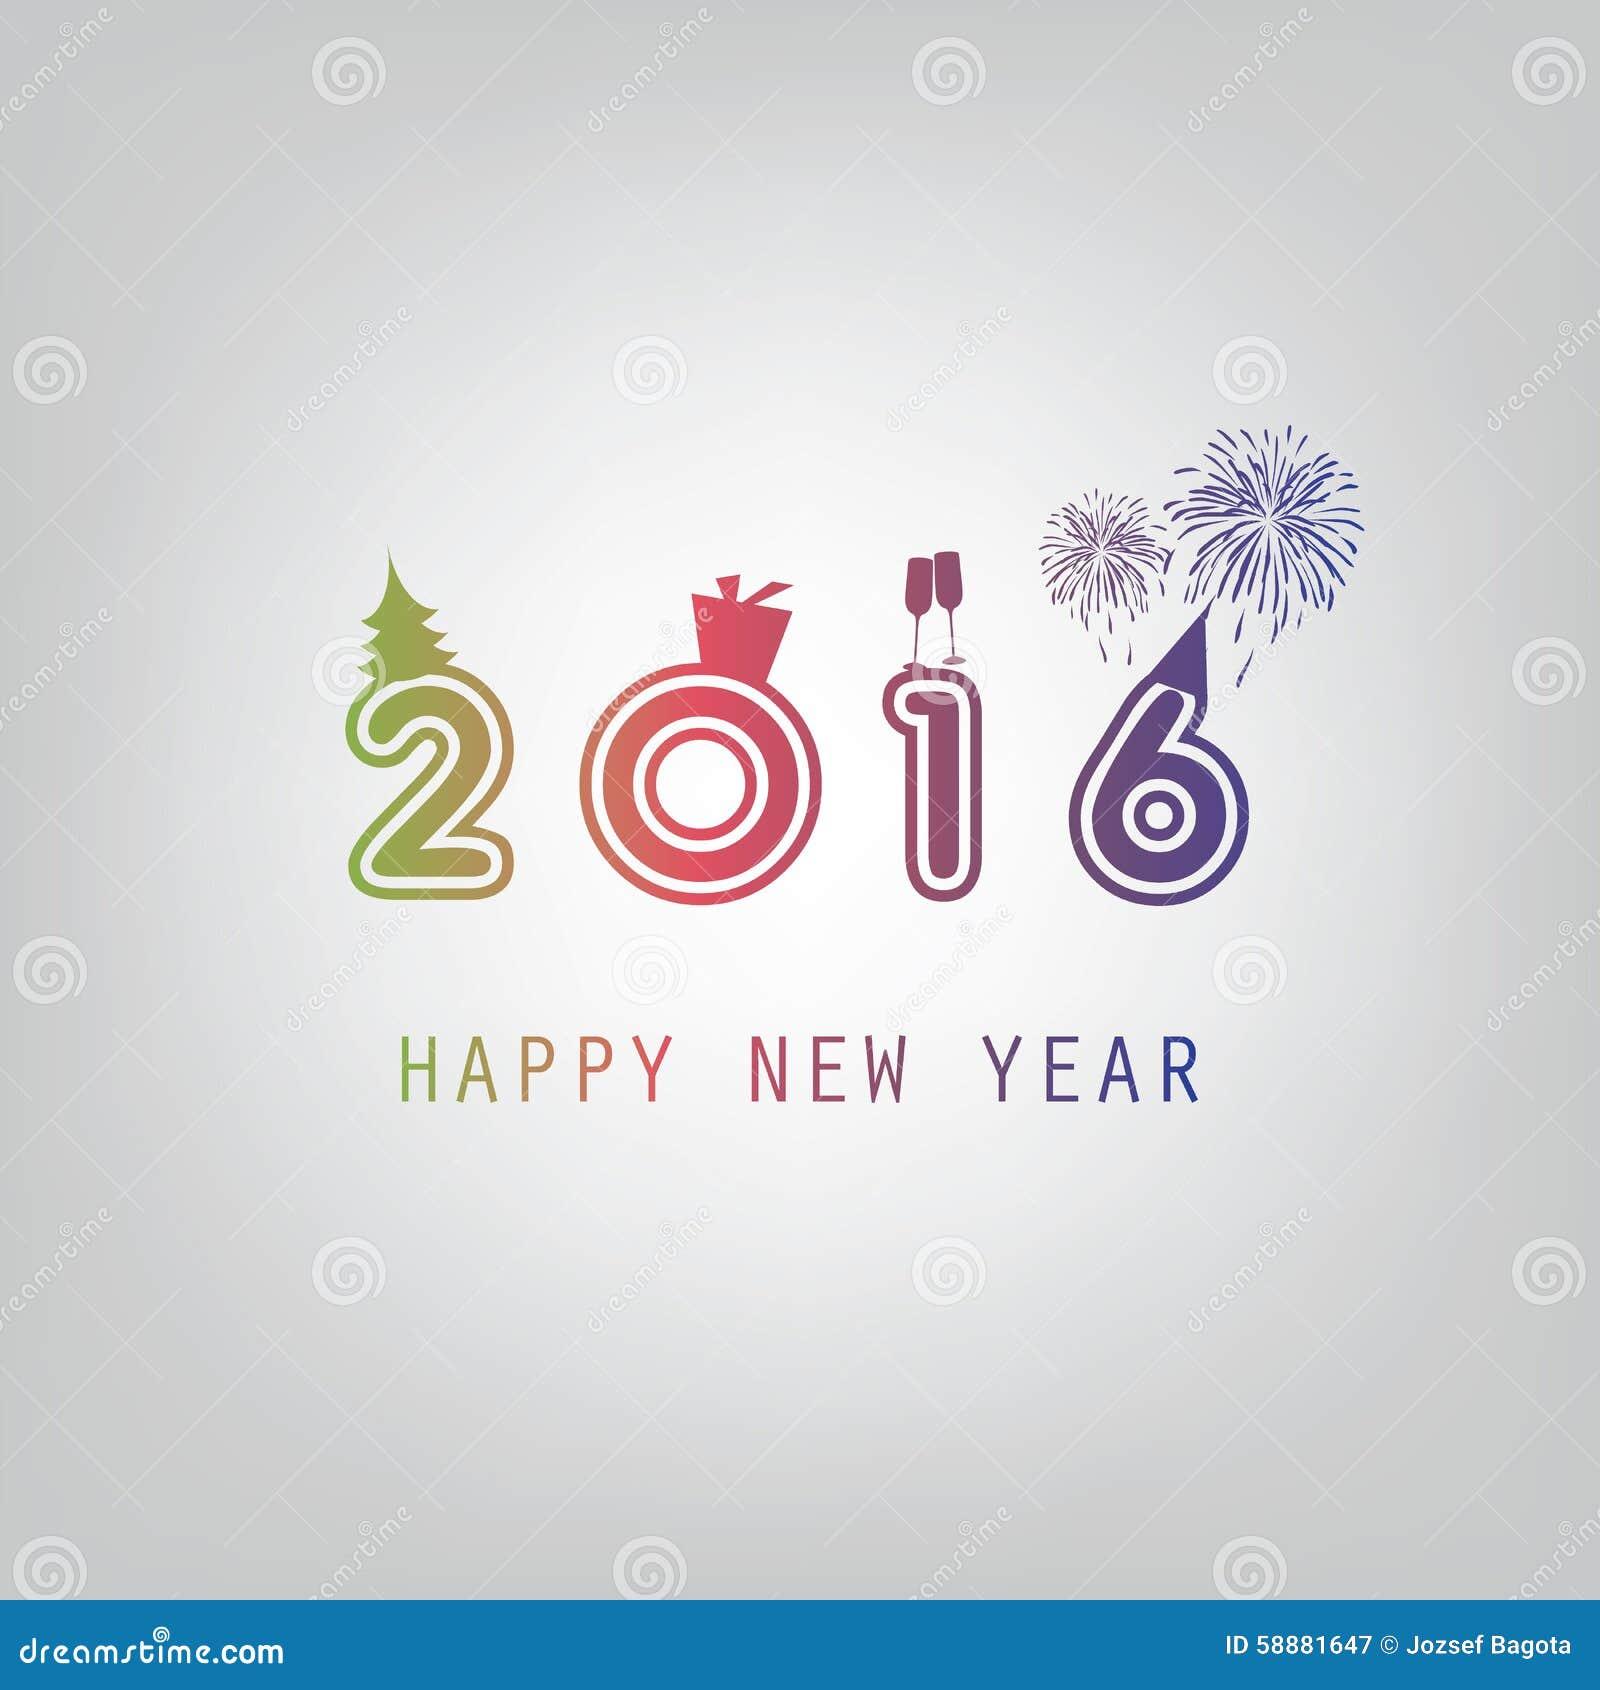 new year wishes essay Advertisements: नव वर्ष पर निबंध | essay on new year in hindi भारतवर्ष ने विश्व को काल गणना.